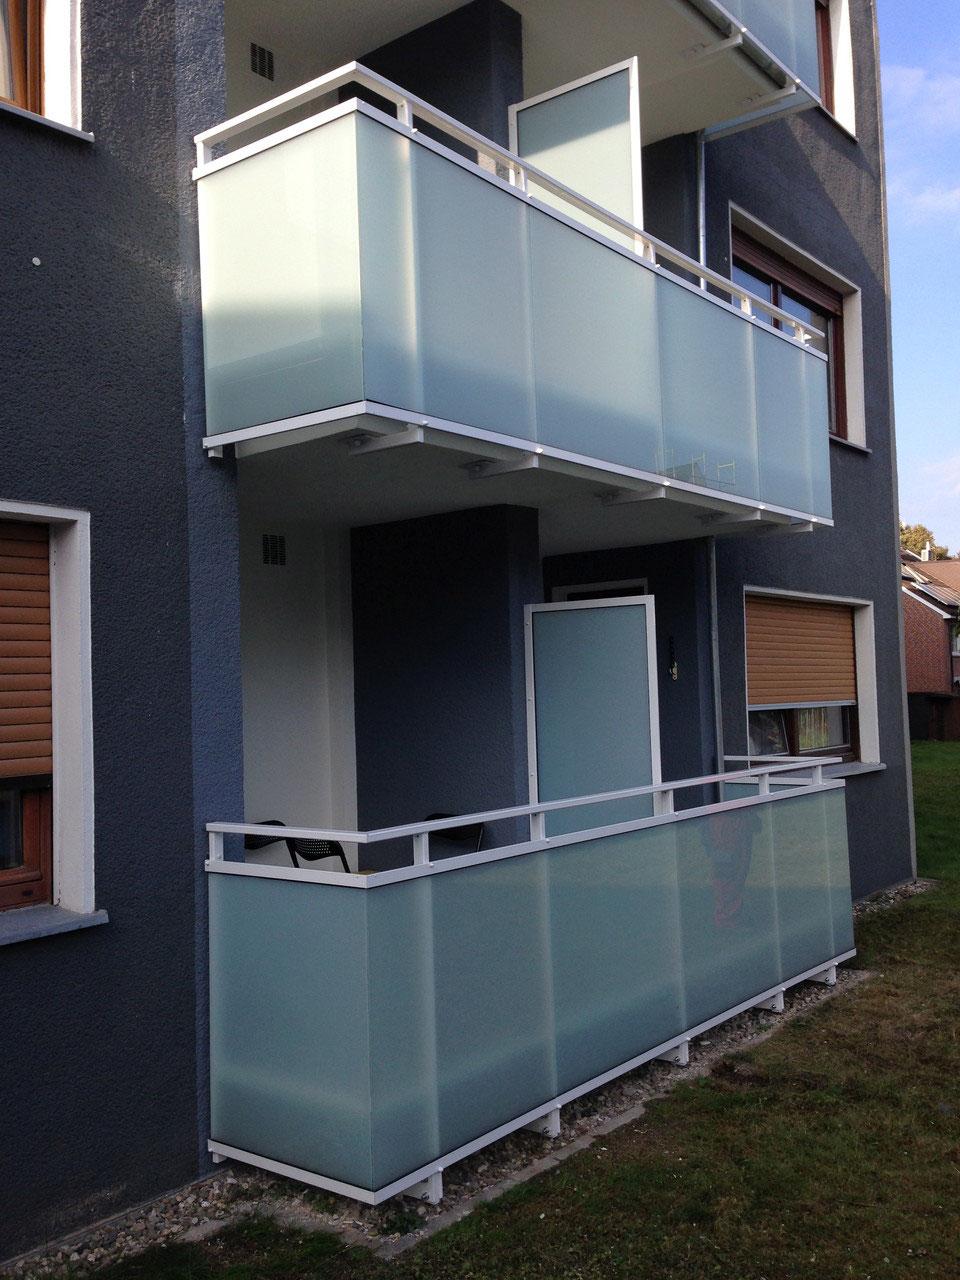 balkonsanierung fassadenbau klein impelmann gmbh schimmelfreies zuhause in duisburg. Black Bedroom Furniture Sets. Home Design Ideas